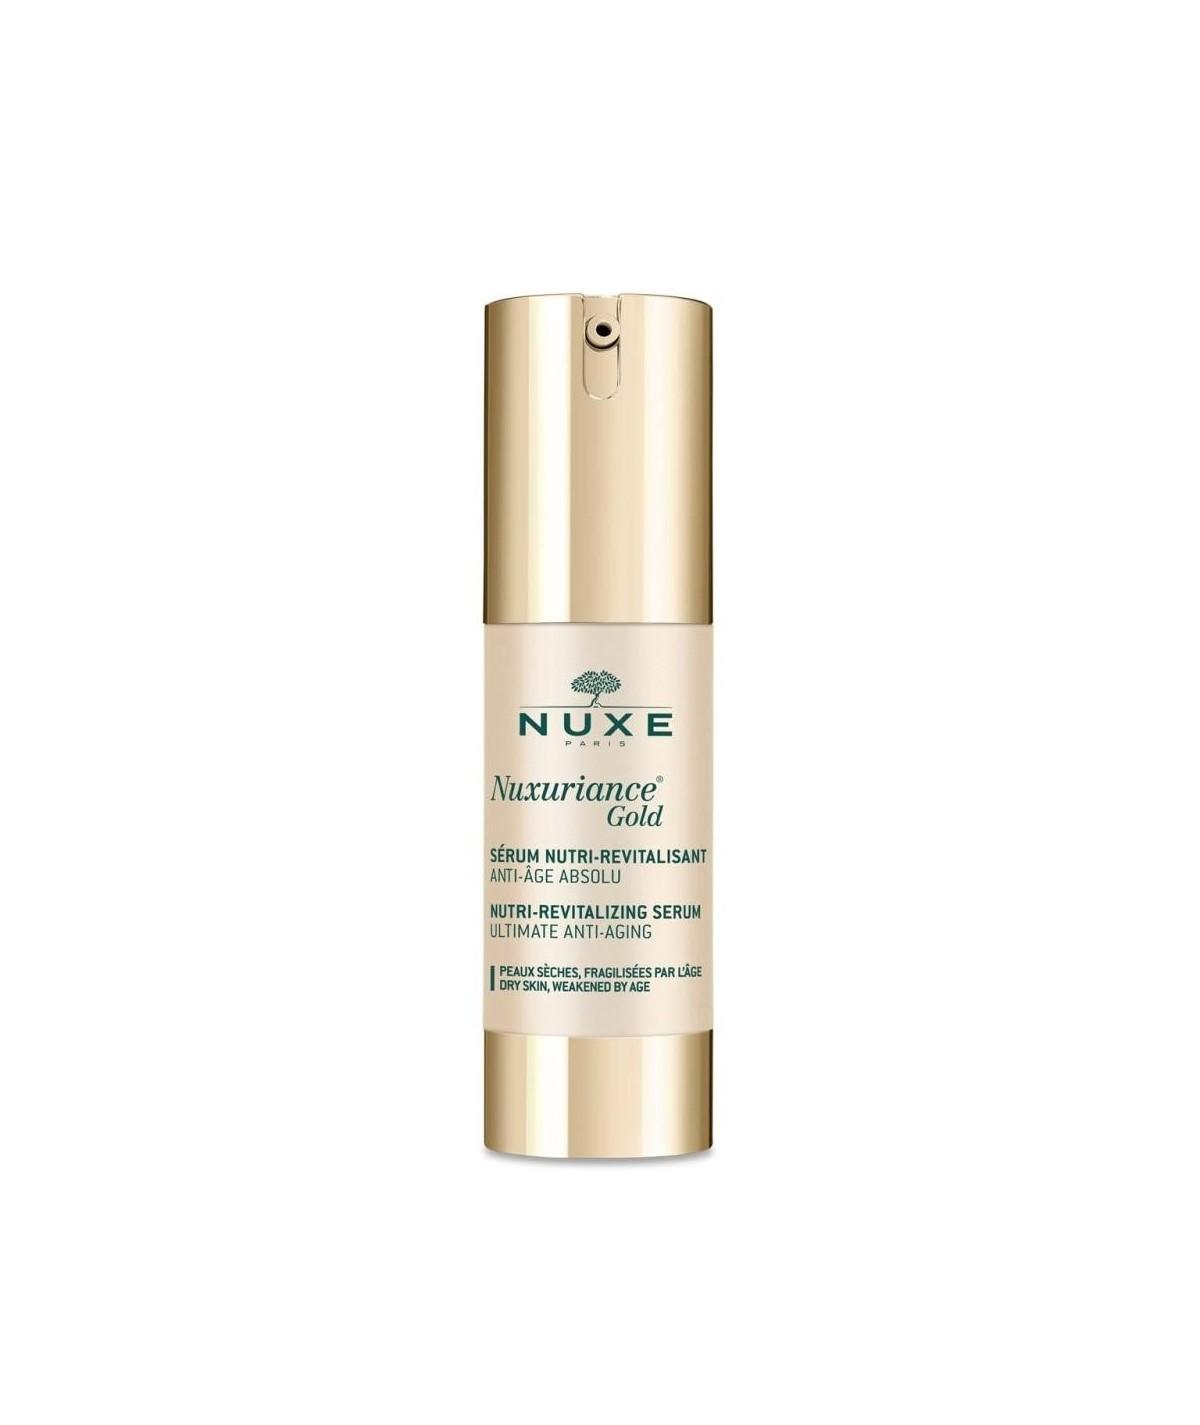 Nuxe Nuxuriance Gold Sérum Nutri-Revitalizante 30 ml